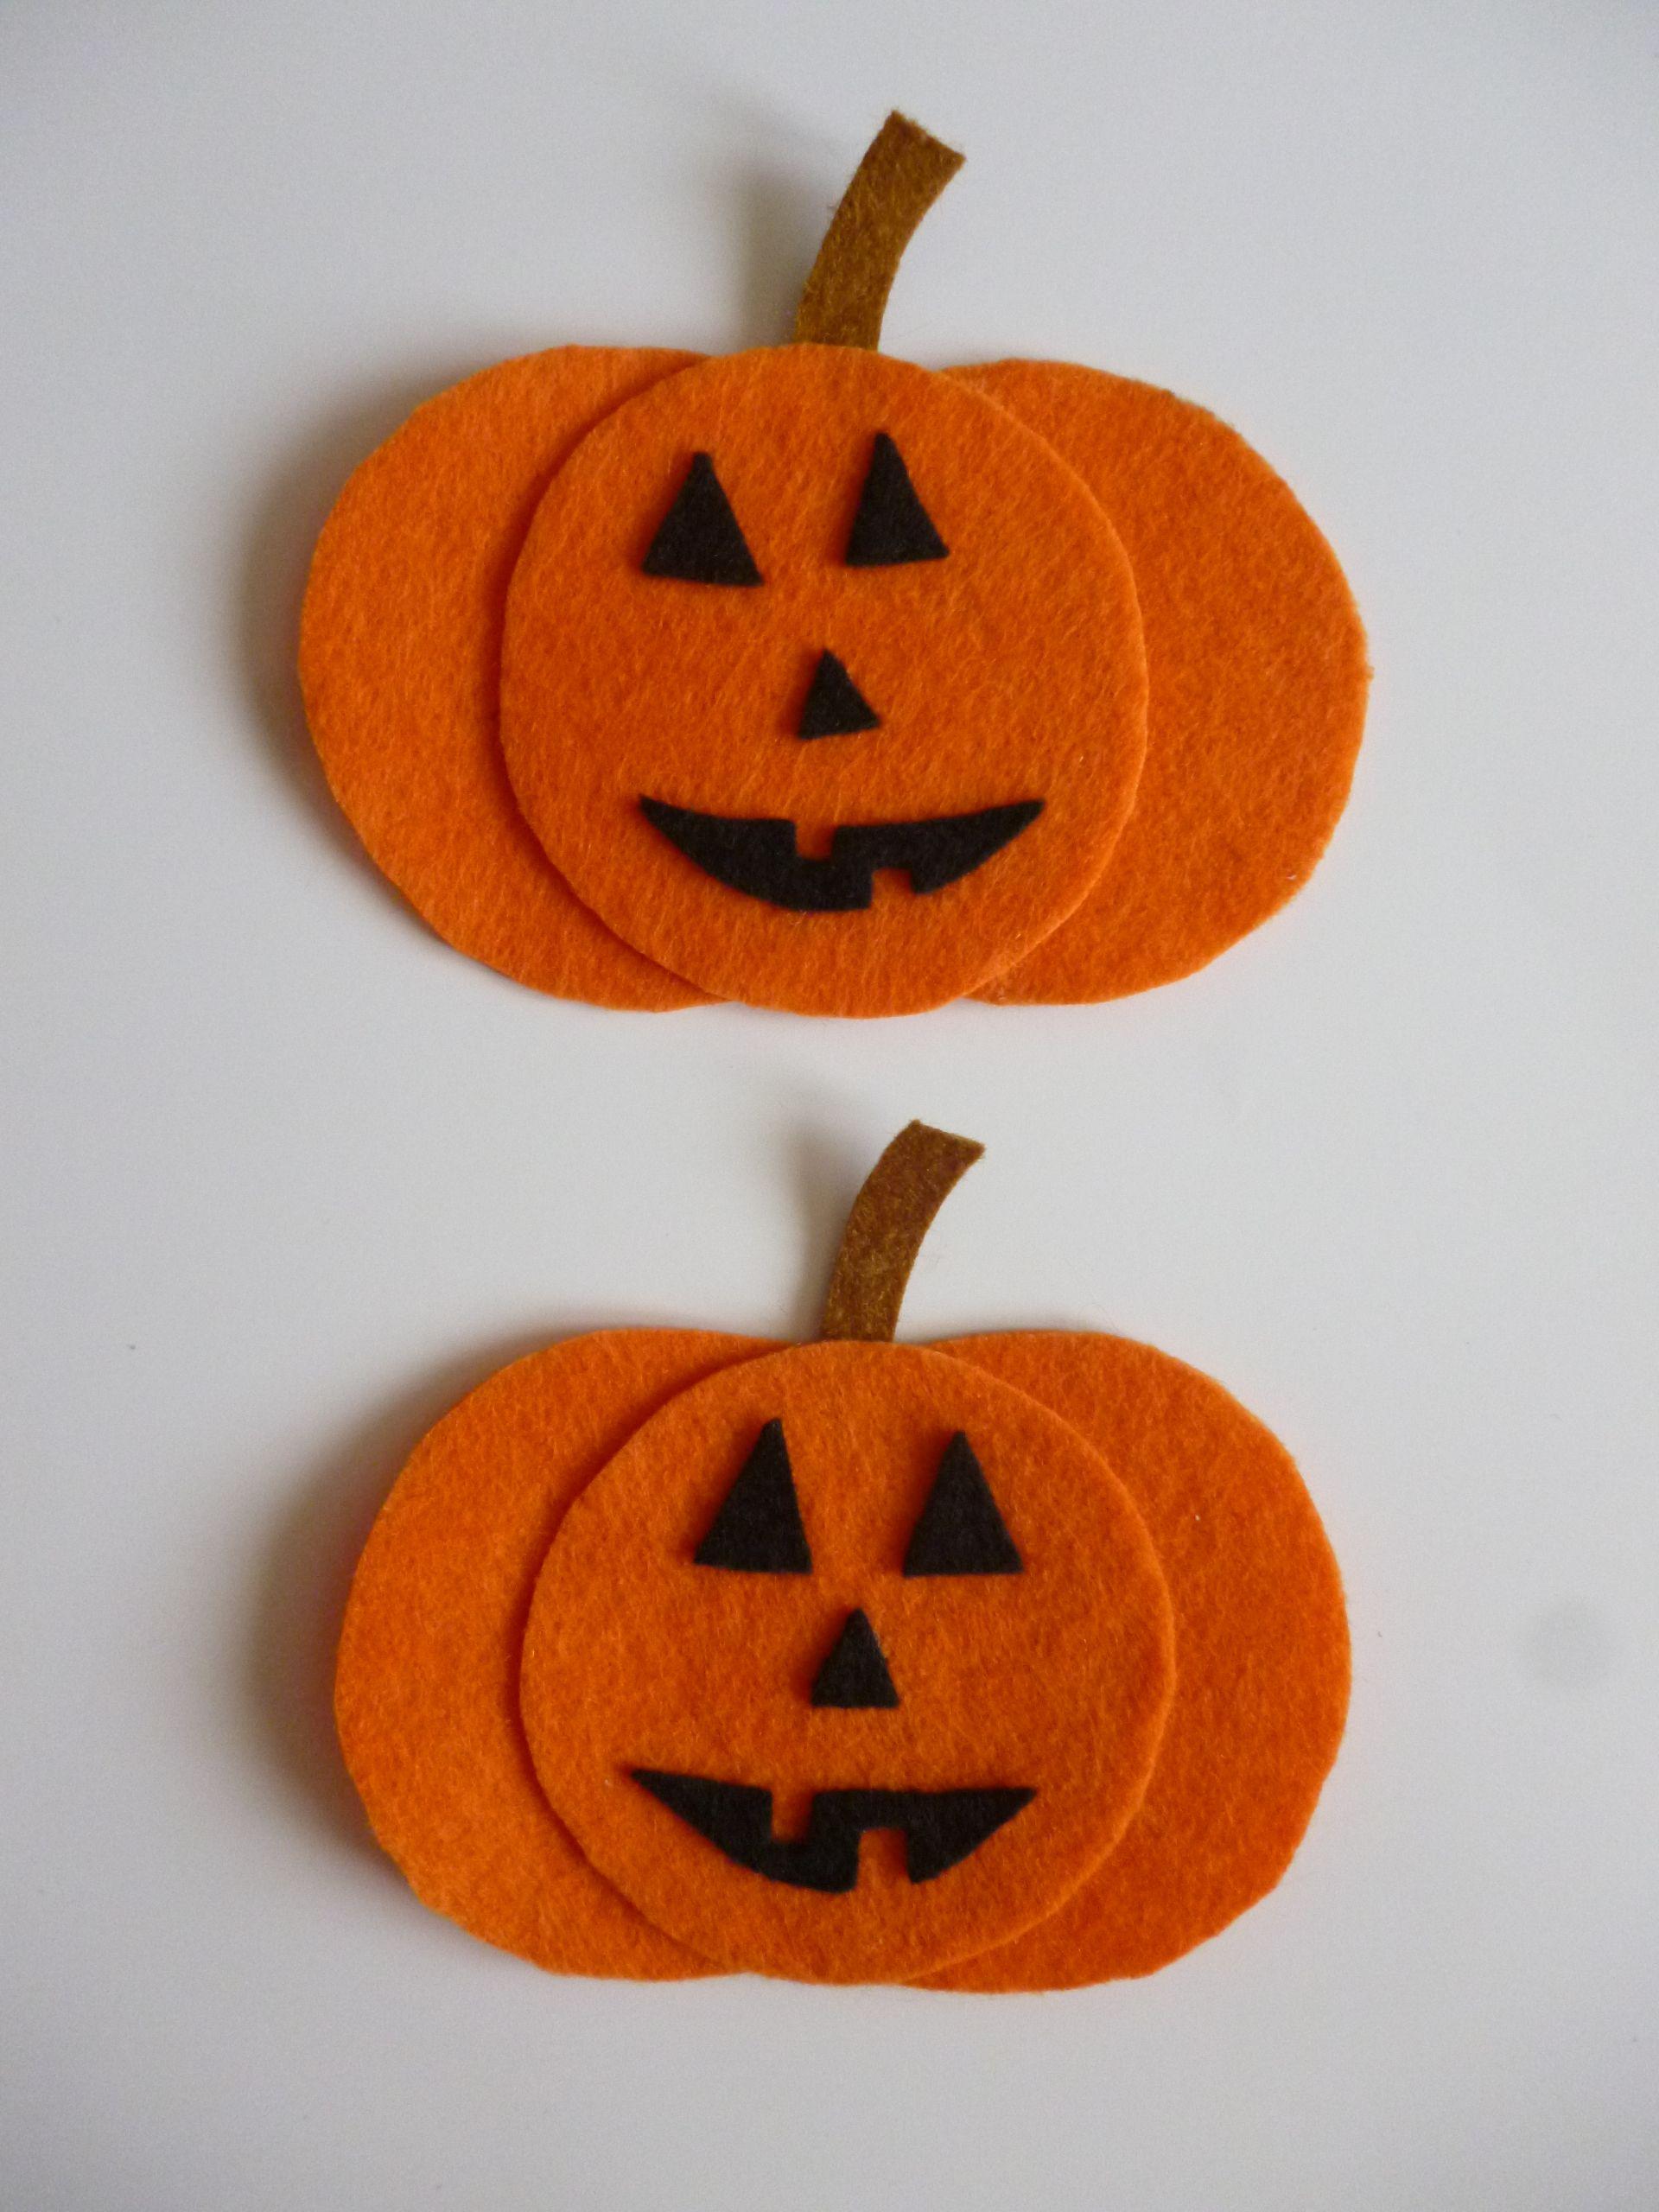 Calabazas de fieltro para Halloween. Cosas de halloween